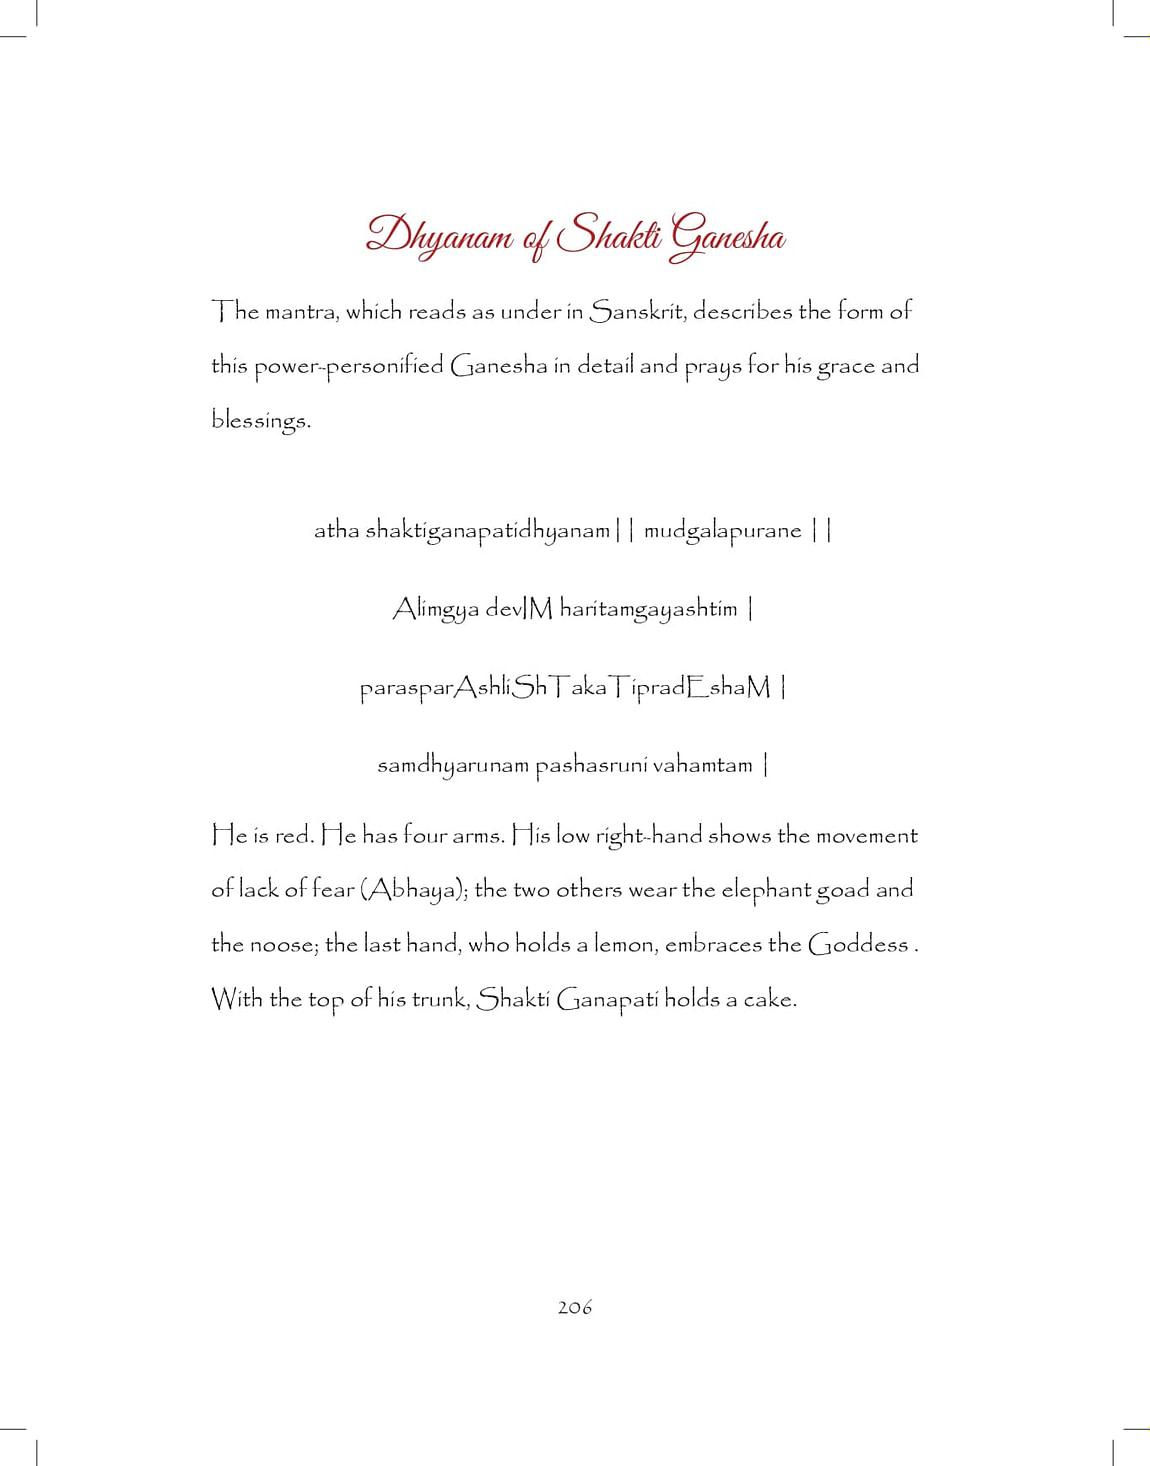 Ganesh-print_pages-to-jpg-0206.jpg